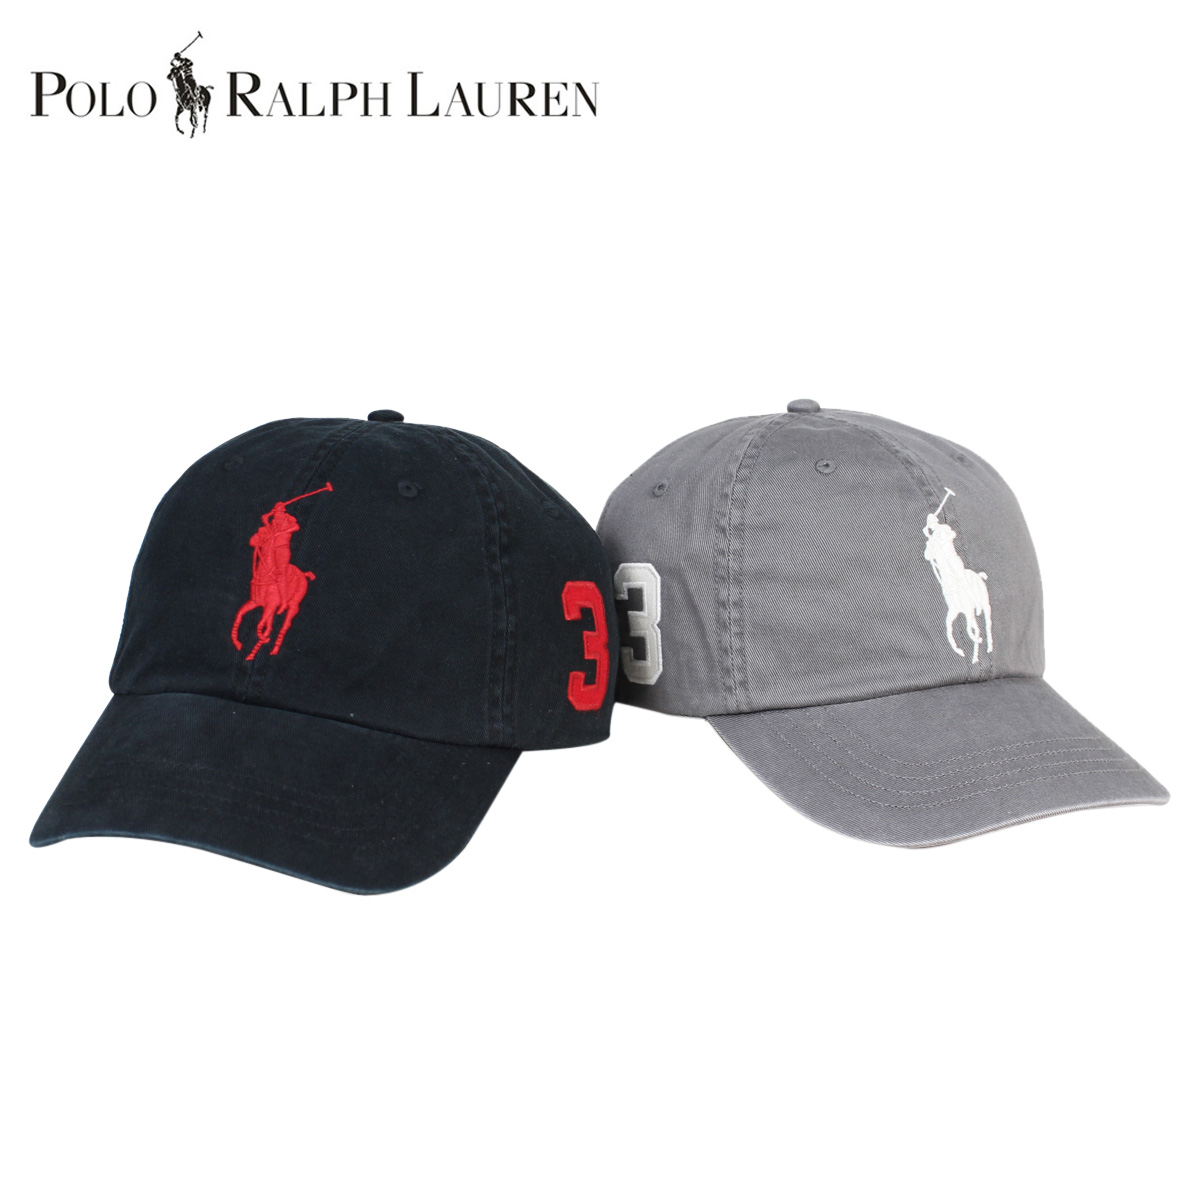 ALLSPORTS  POLO RALPH LAUREN cap hat men gap Dis snapback cap Ralph Lauren  polo black gray  11 1 Shinnyu load   1711   7c0167a0569